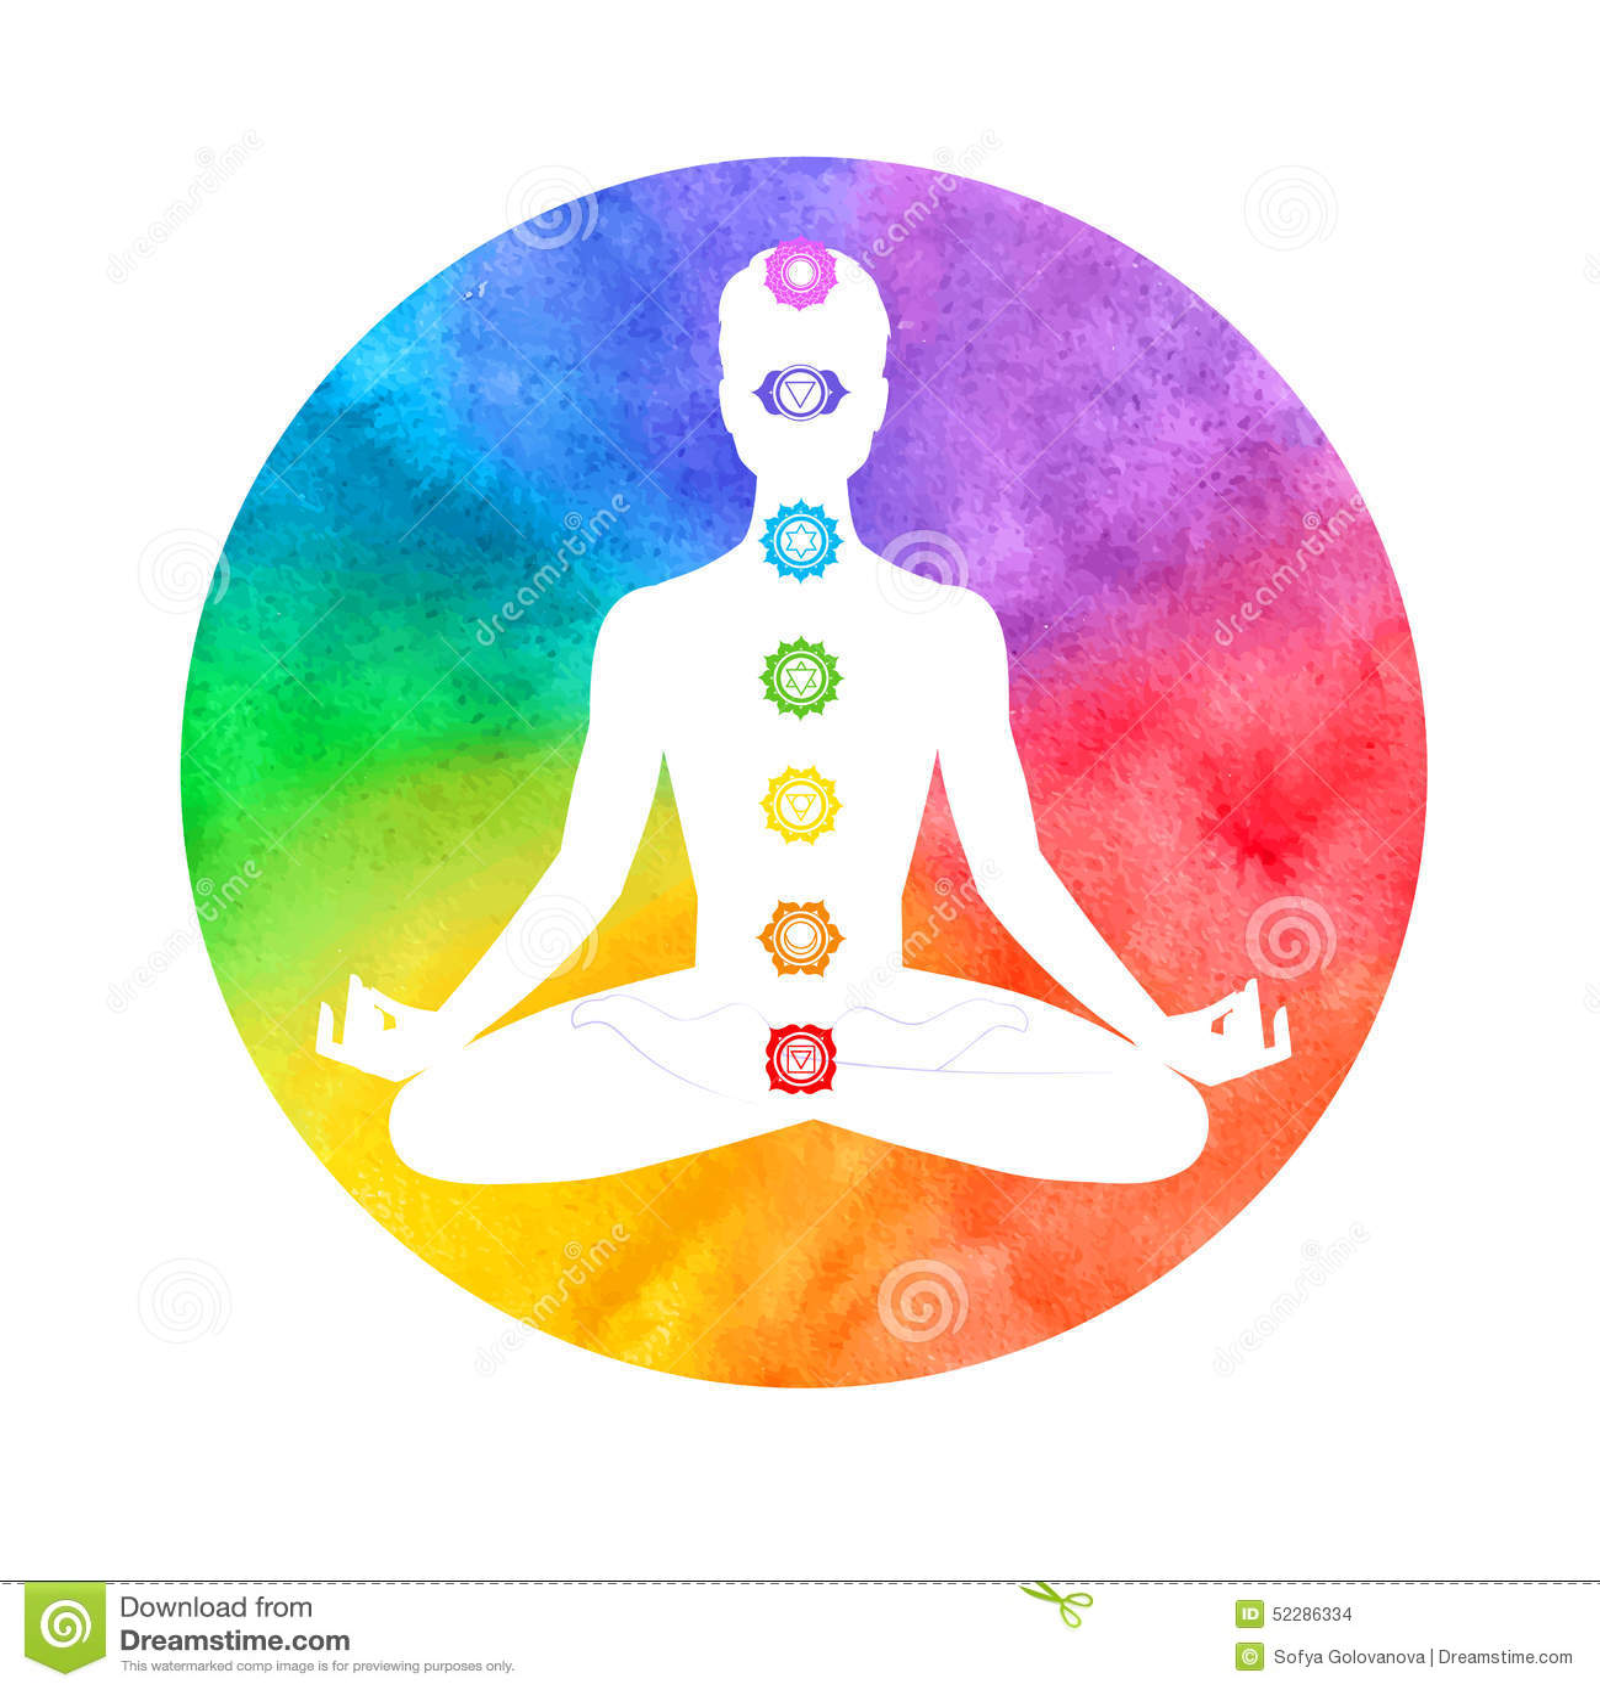 Meditation Aura And Chakras Stock Vector Image 52286334